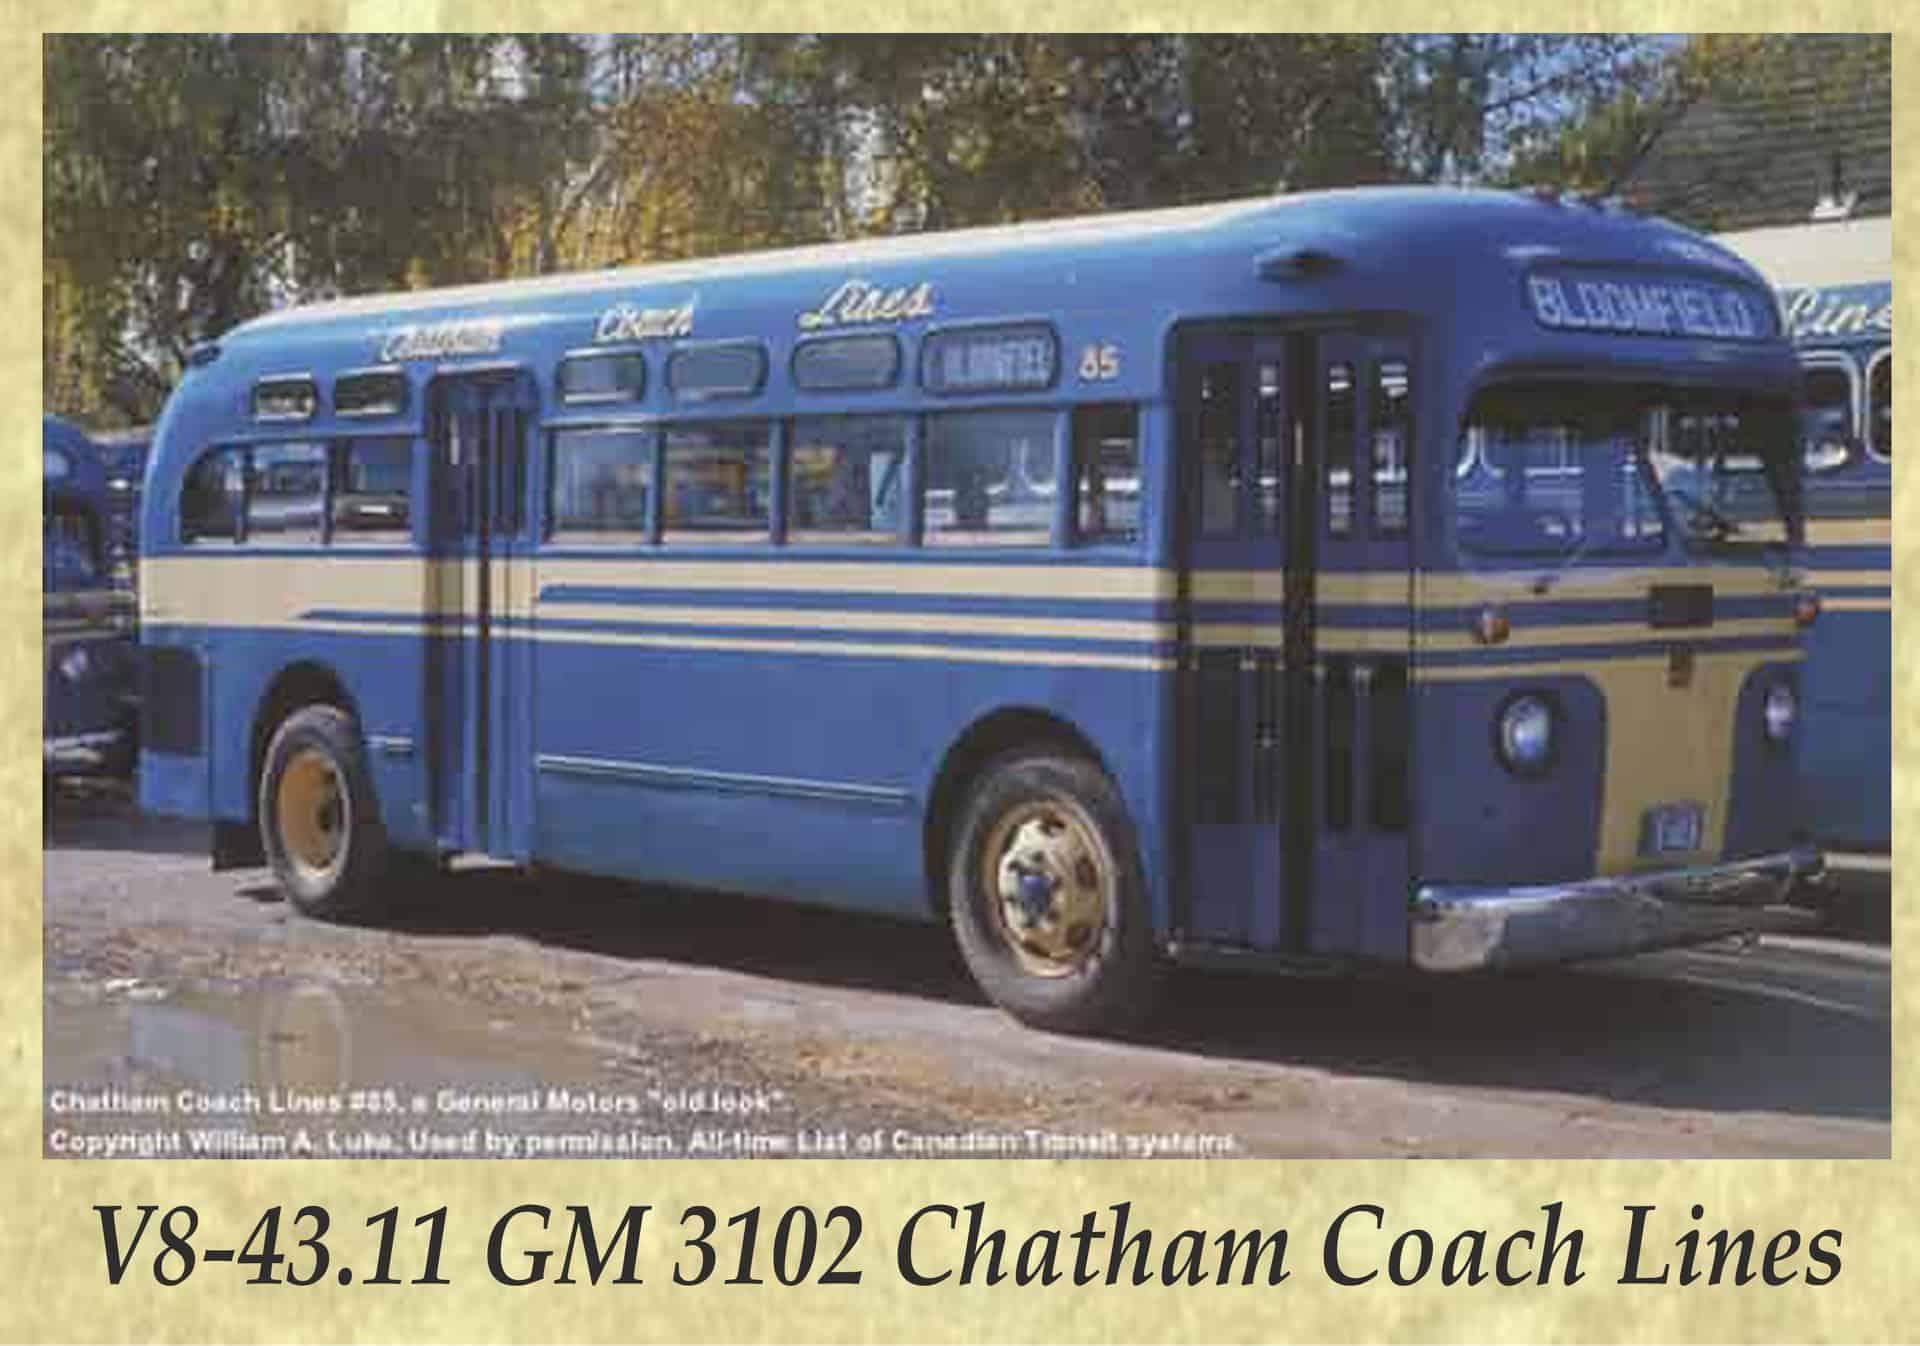 V8-43.11 GM 3102 Chatham Coach Lines